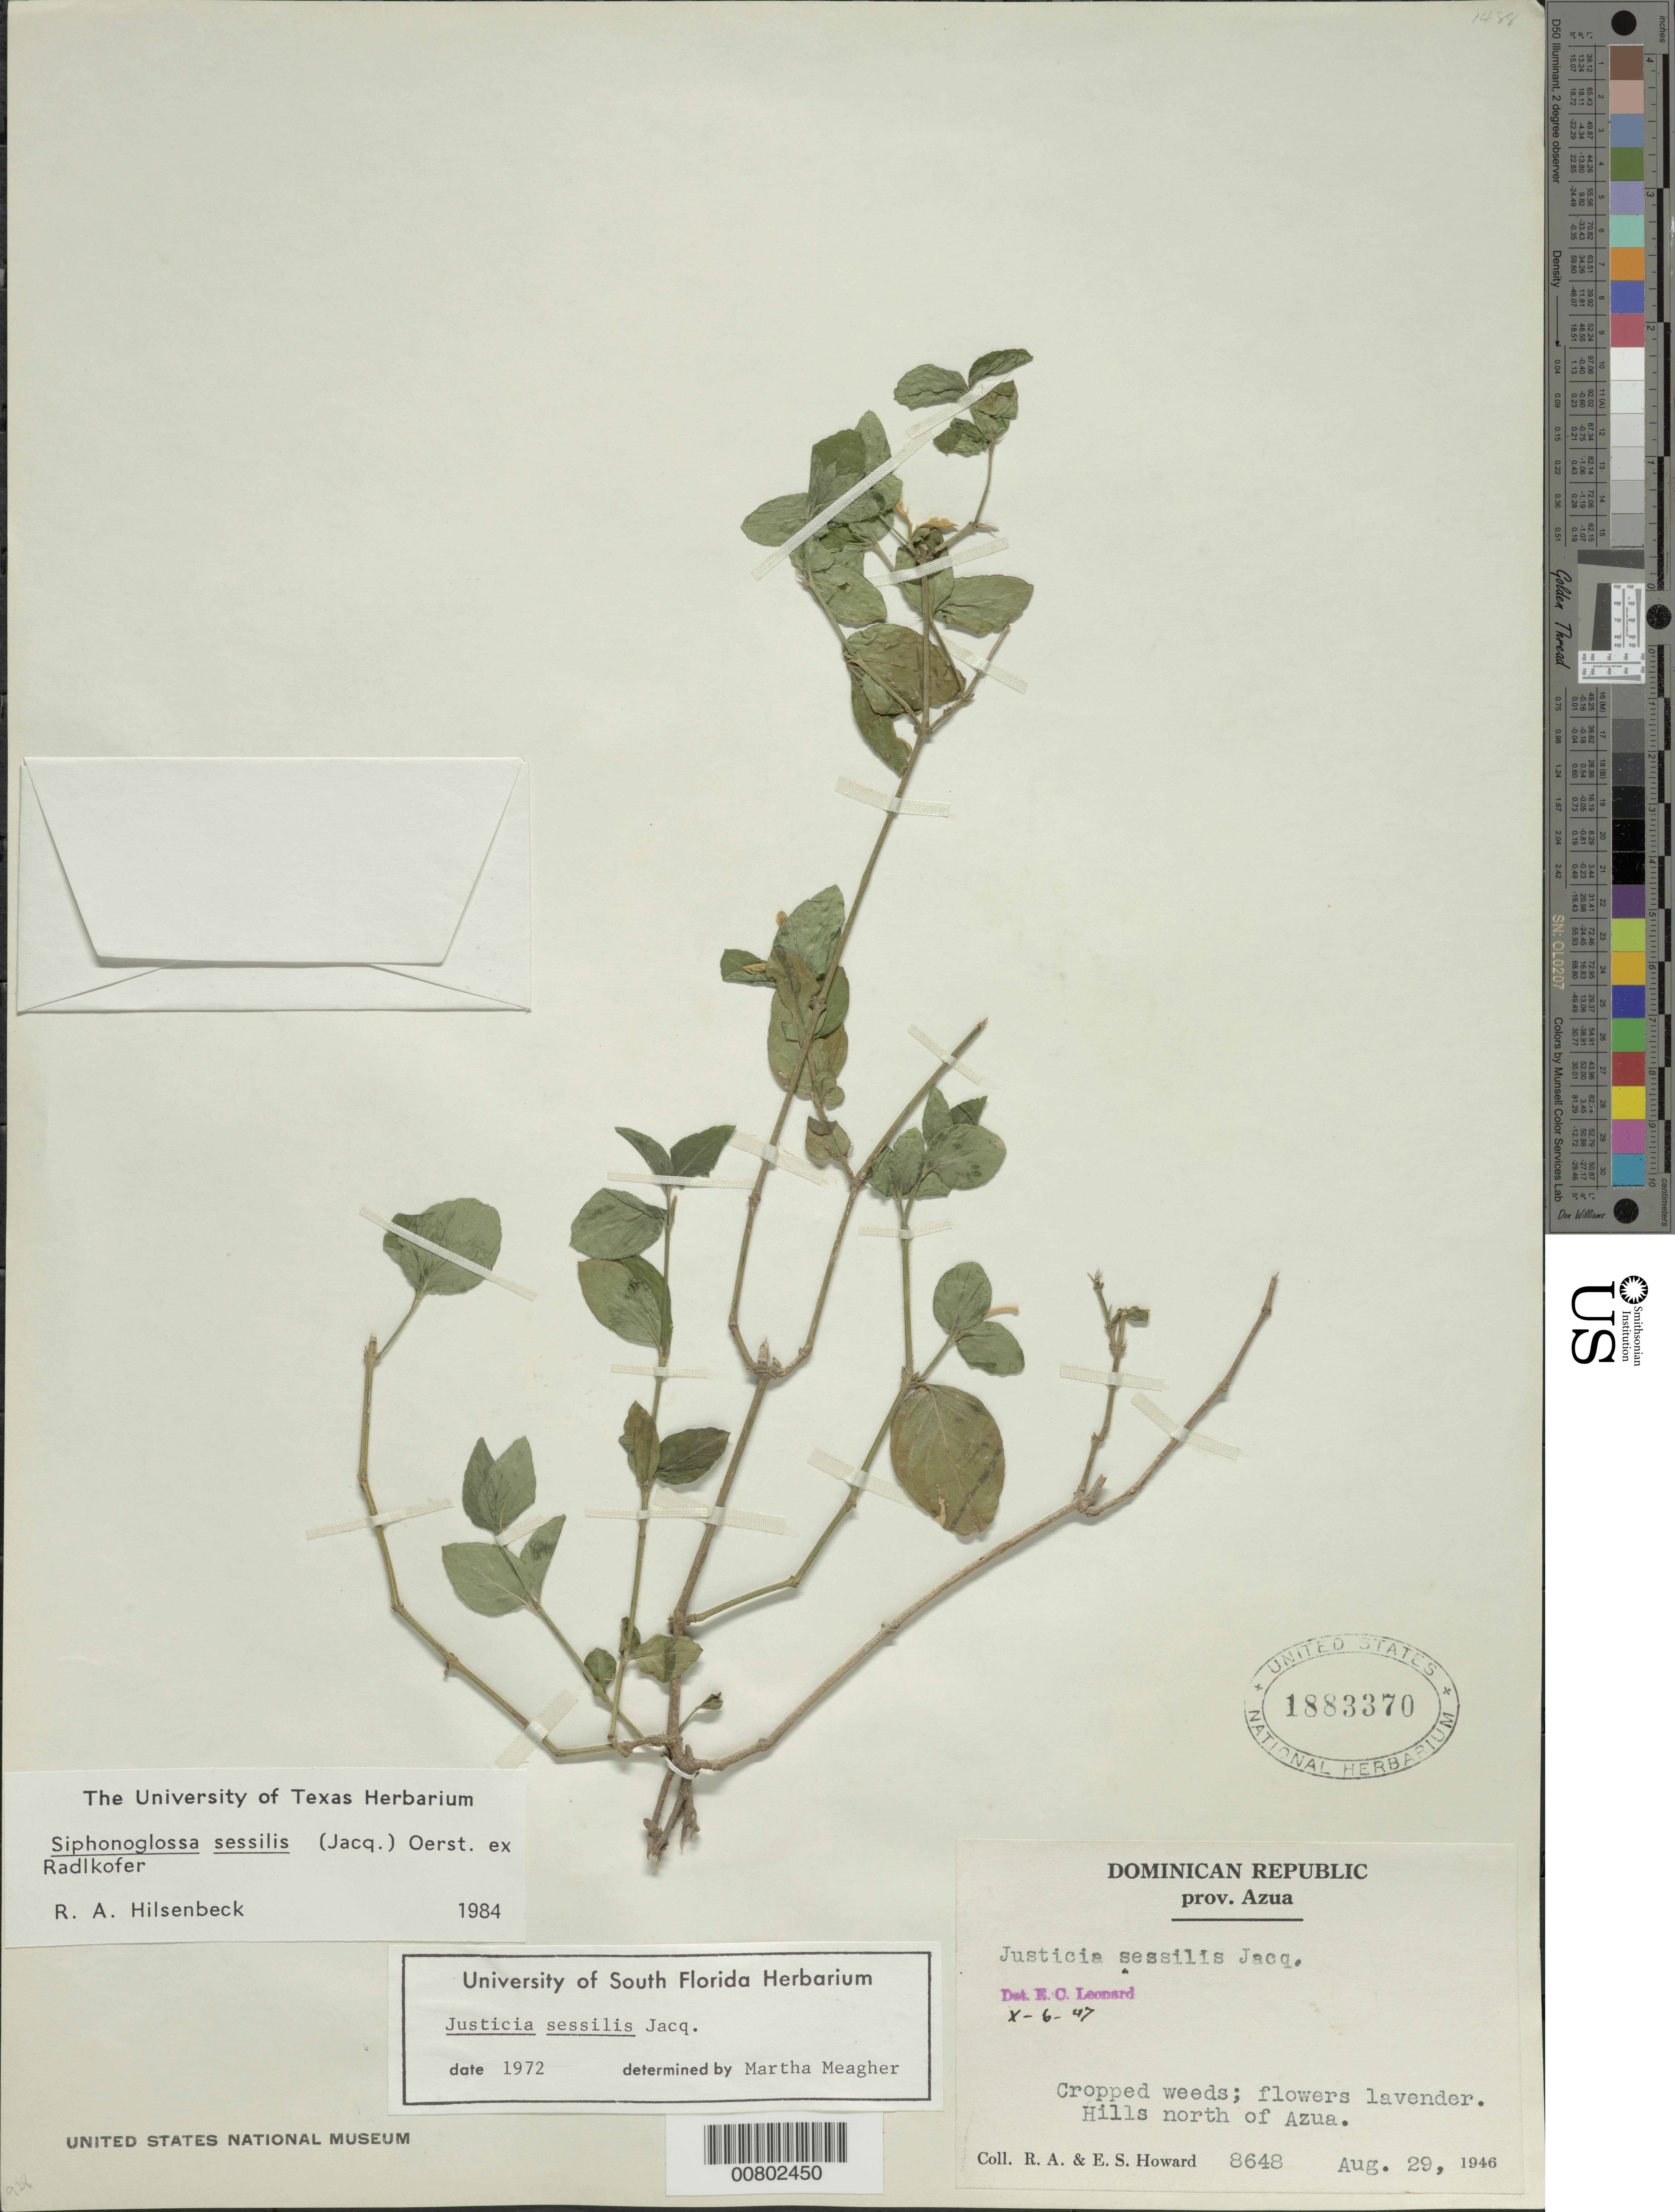 Siphonoglossa sessilis (Jacq.) D.N. Gibson